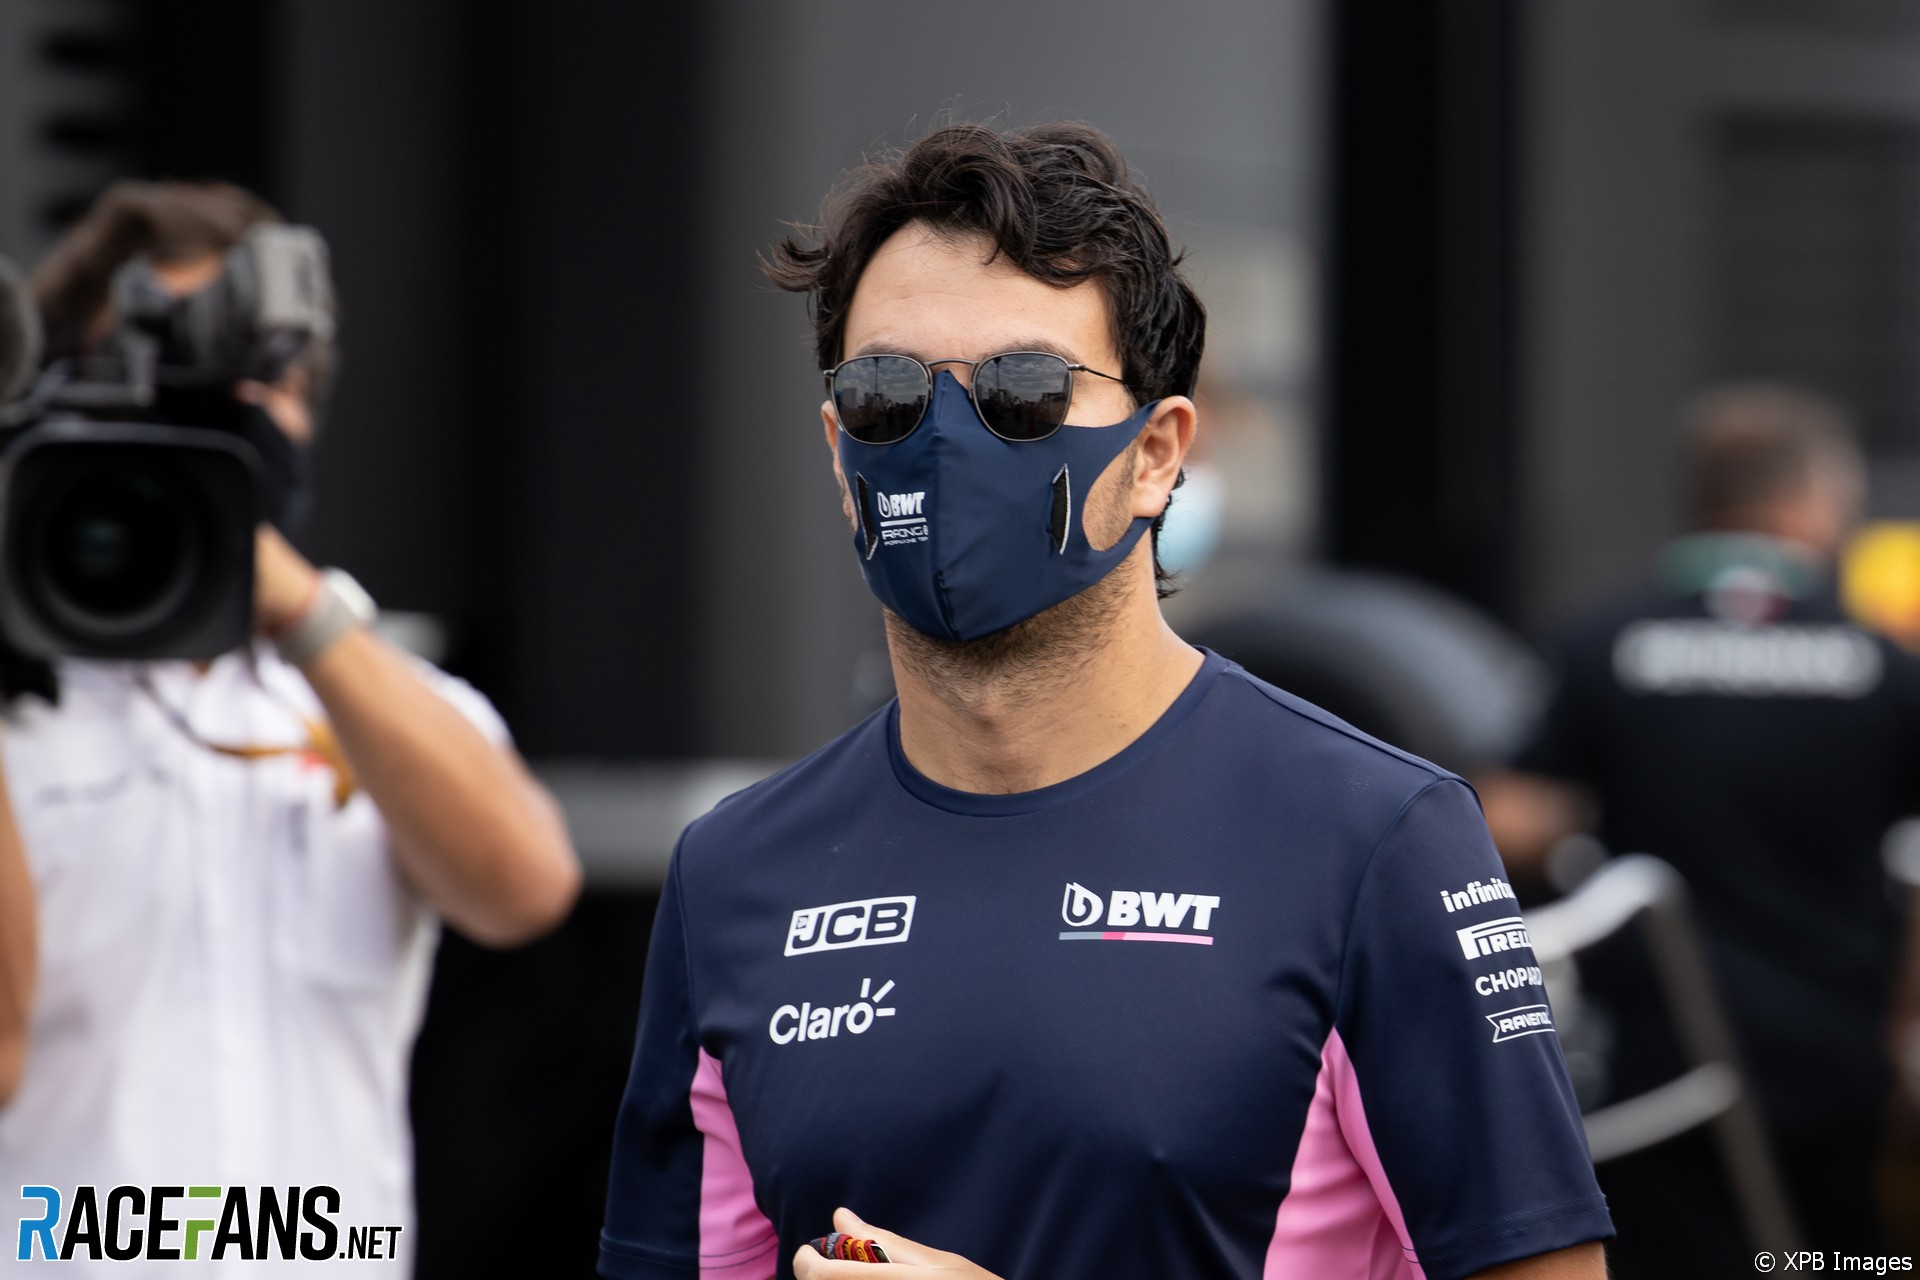 Sergio Perez, Racing Point, Mugello, 2020